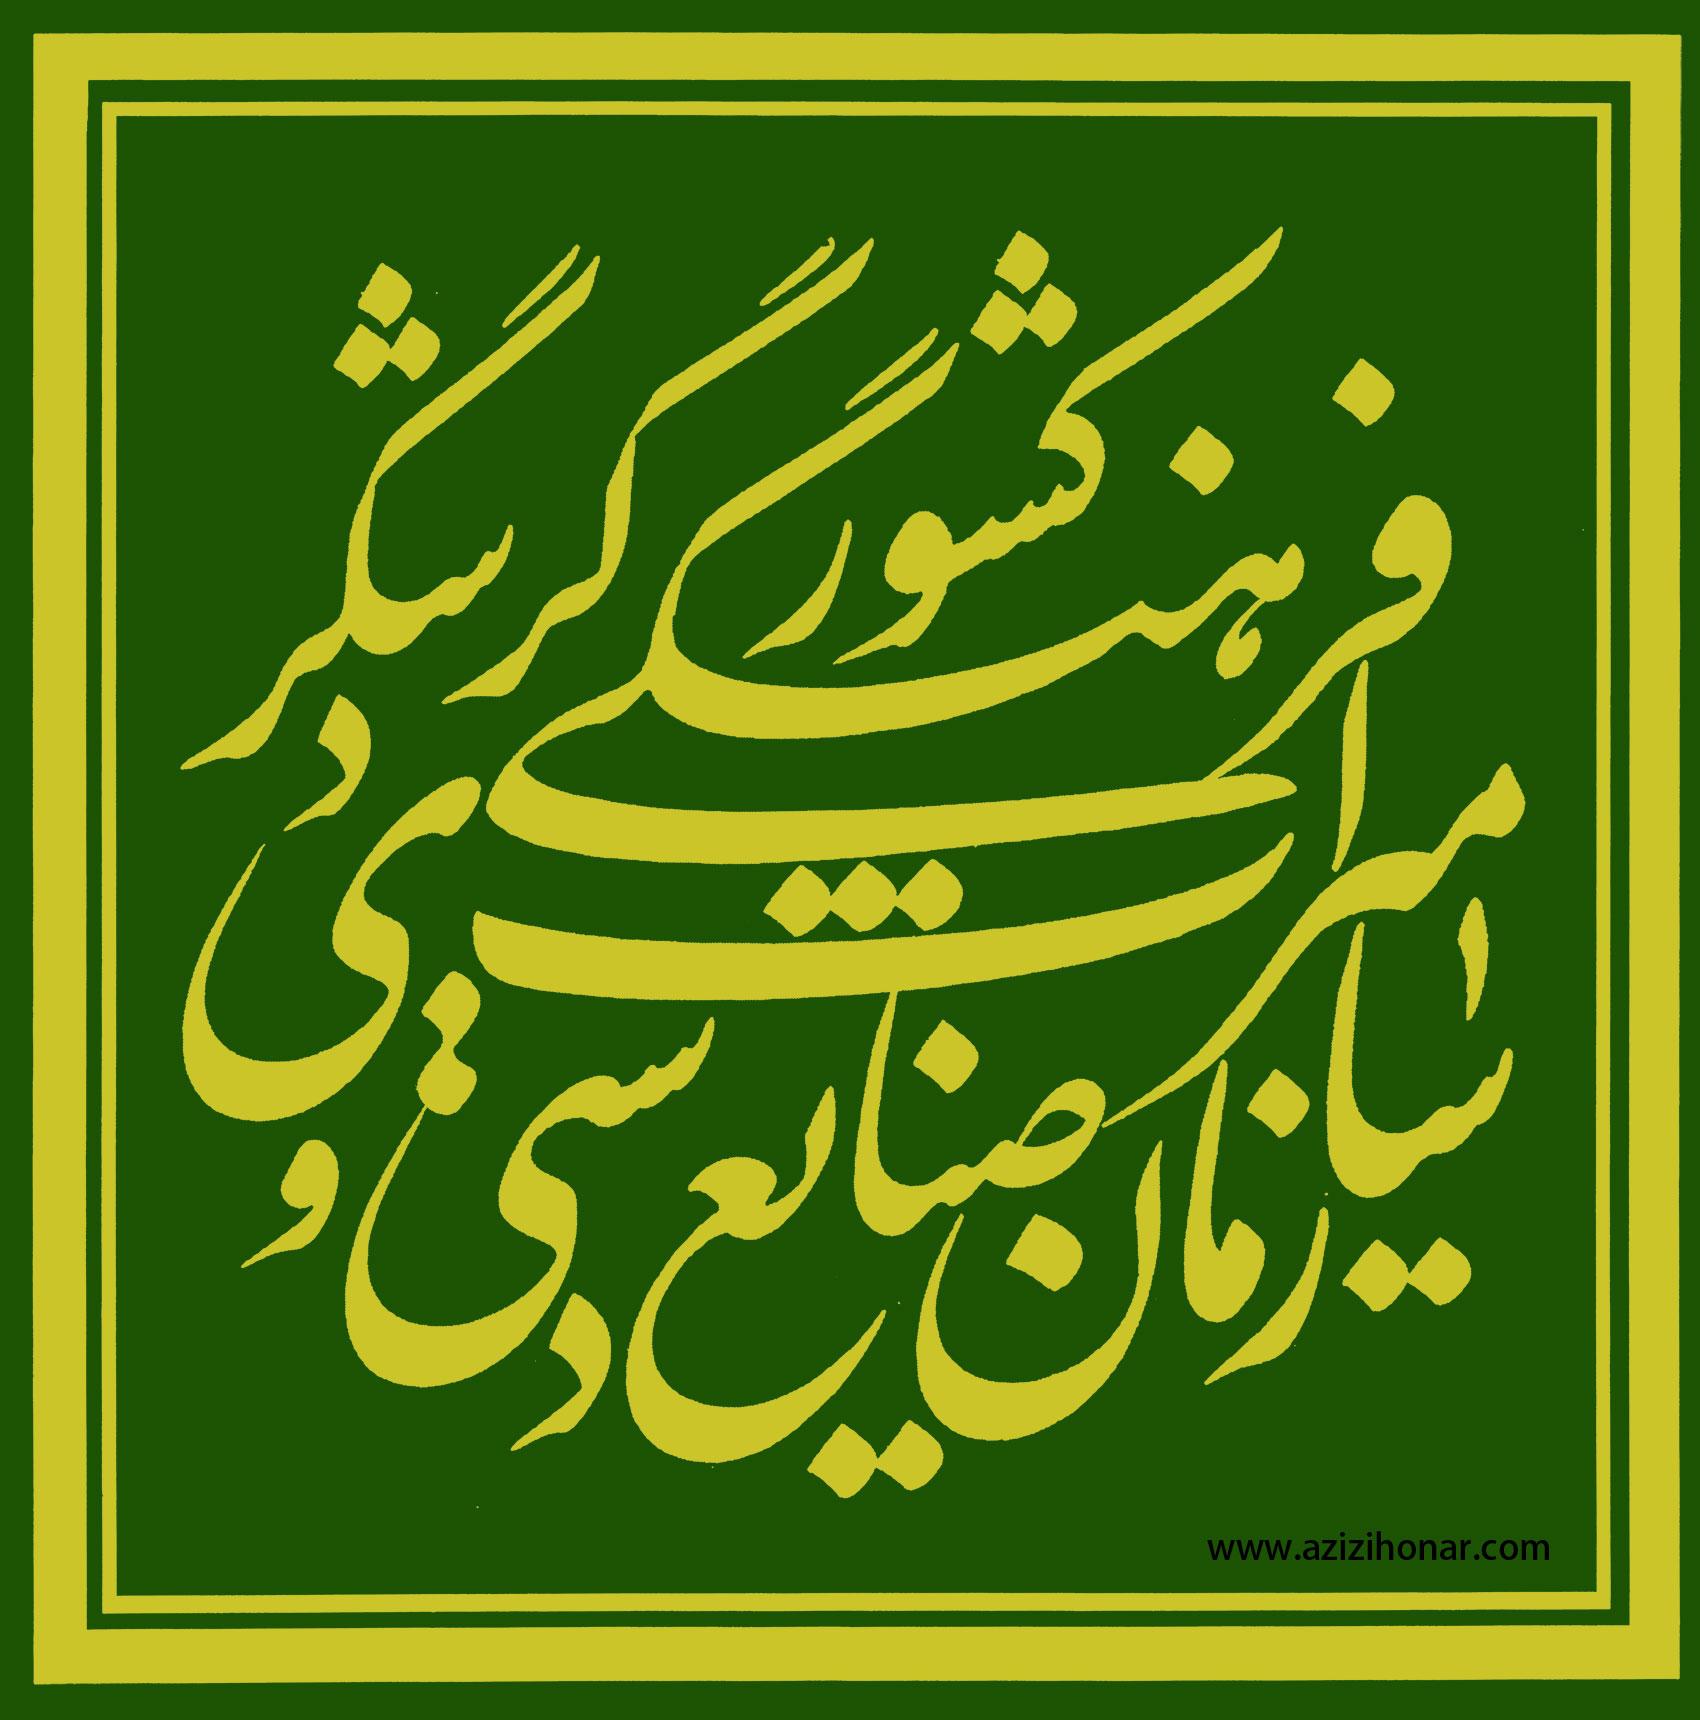 محسن مصلحی